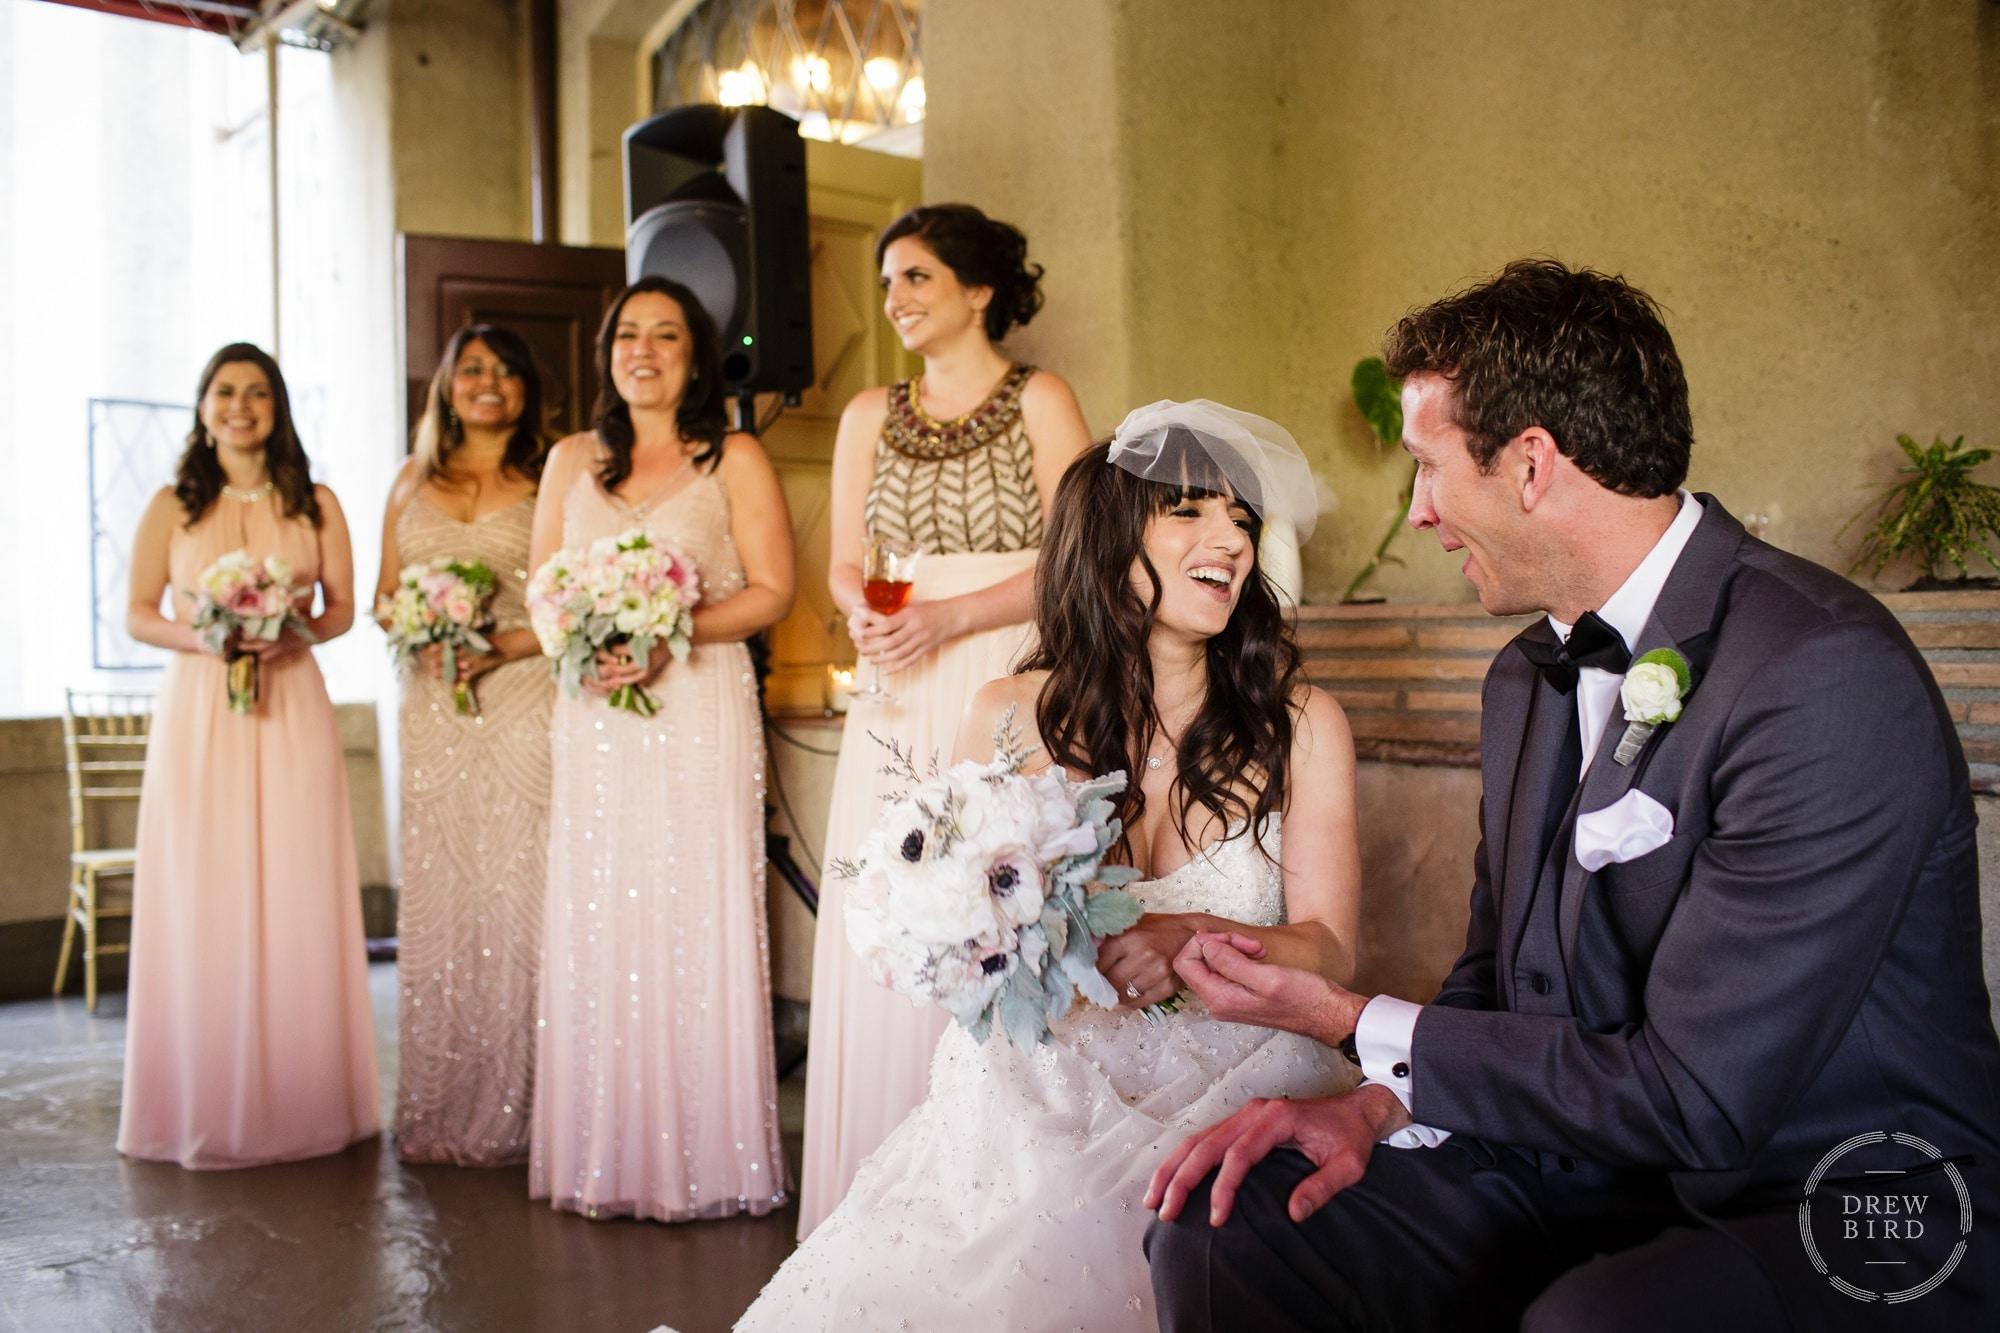 Persian wedding ceremony on the terrace at Berkeley City Club, a Julia Morgan design. Wedding photojournalism by Drew Bird.